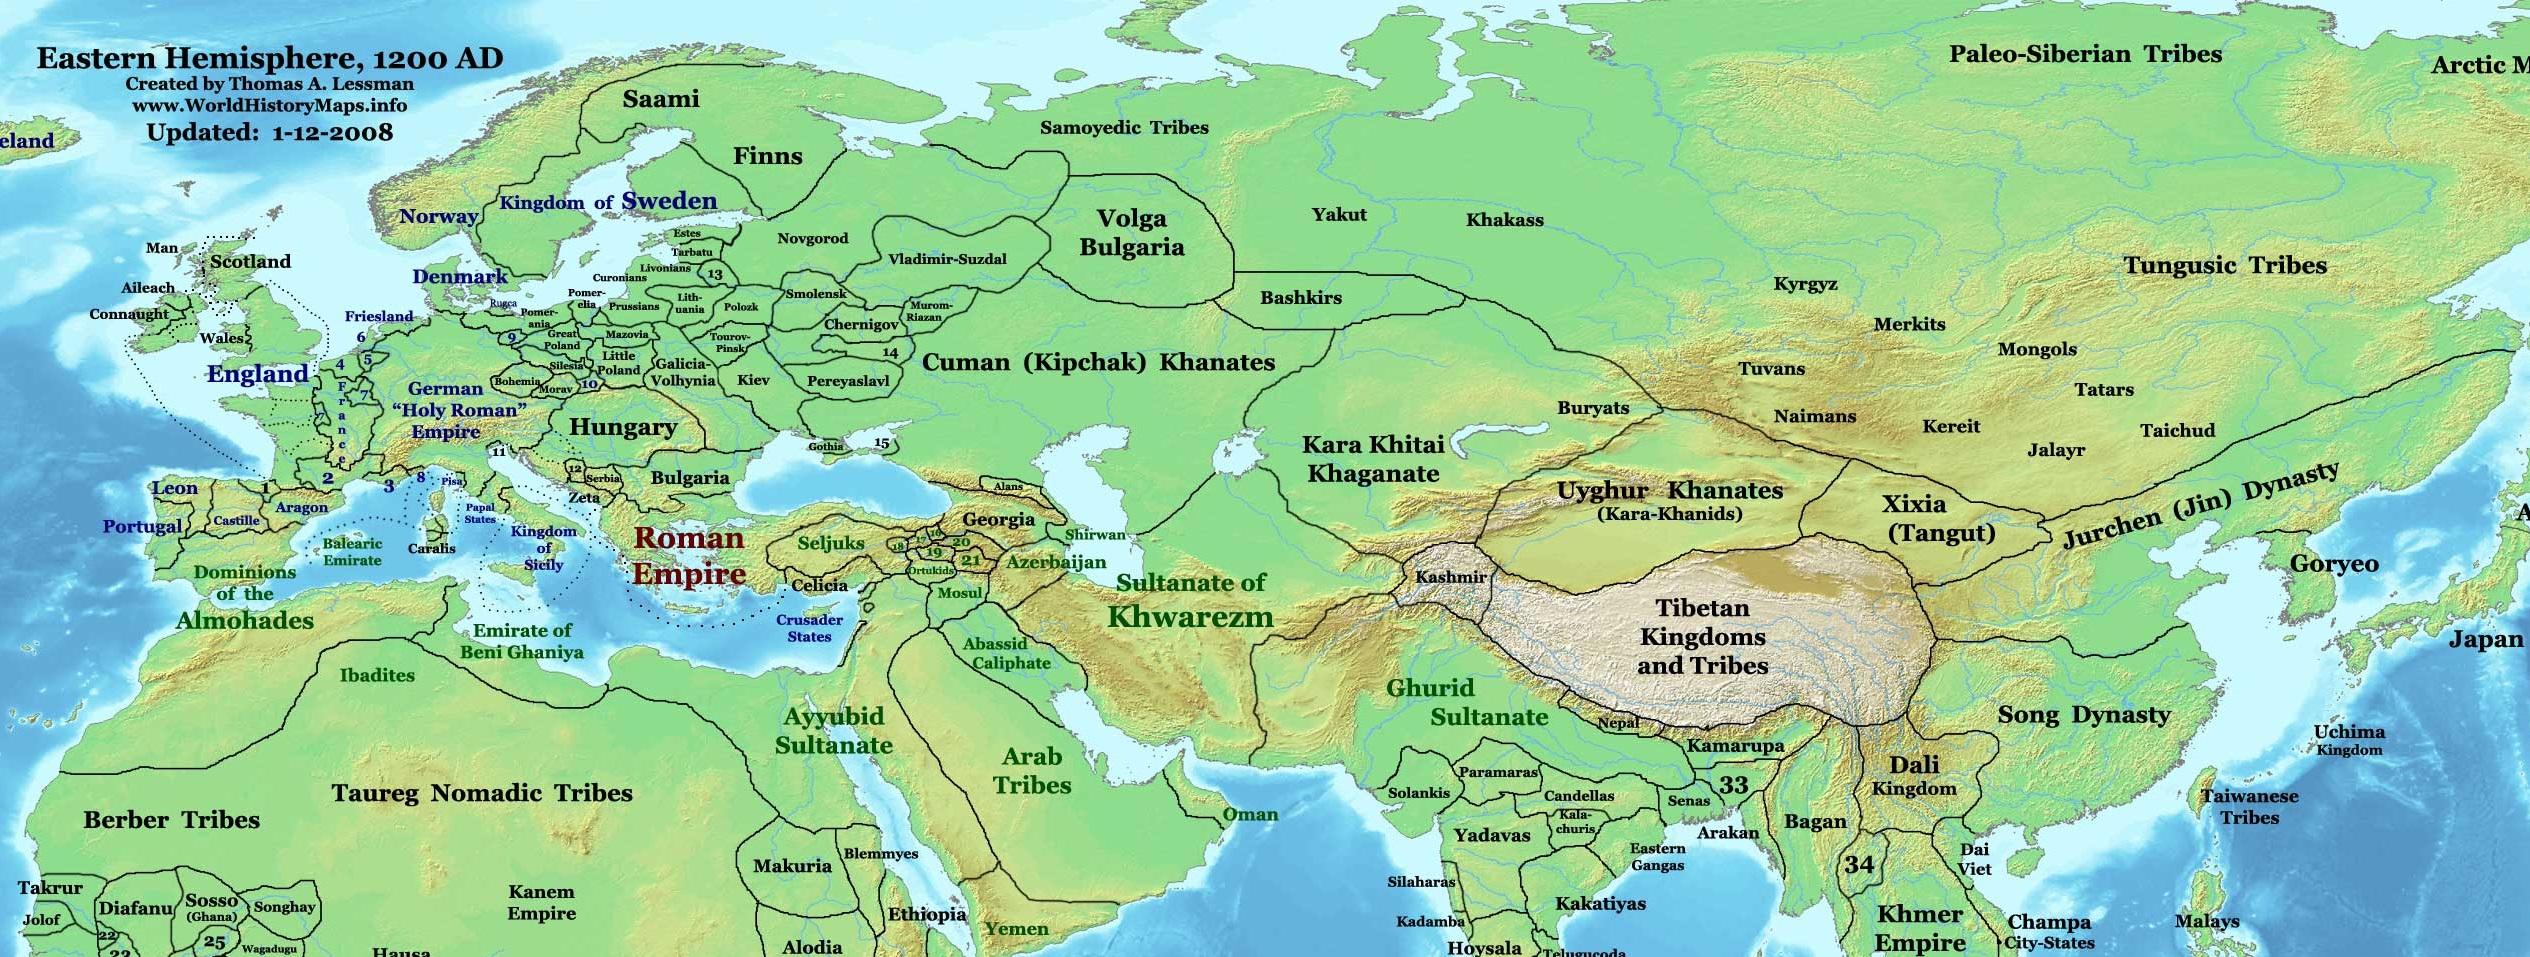 1200 AD